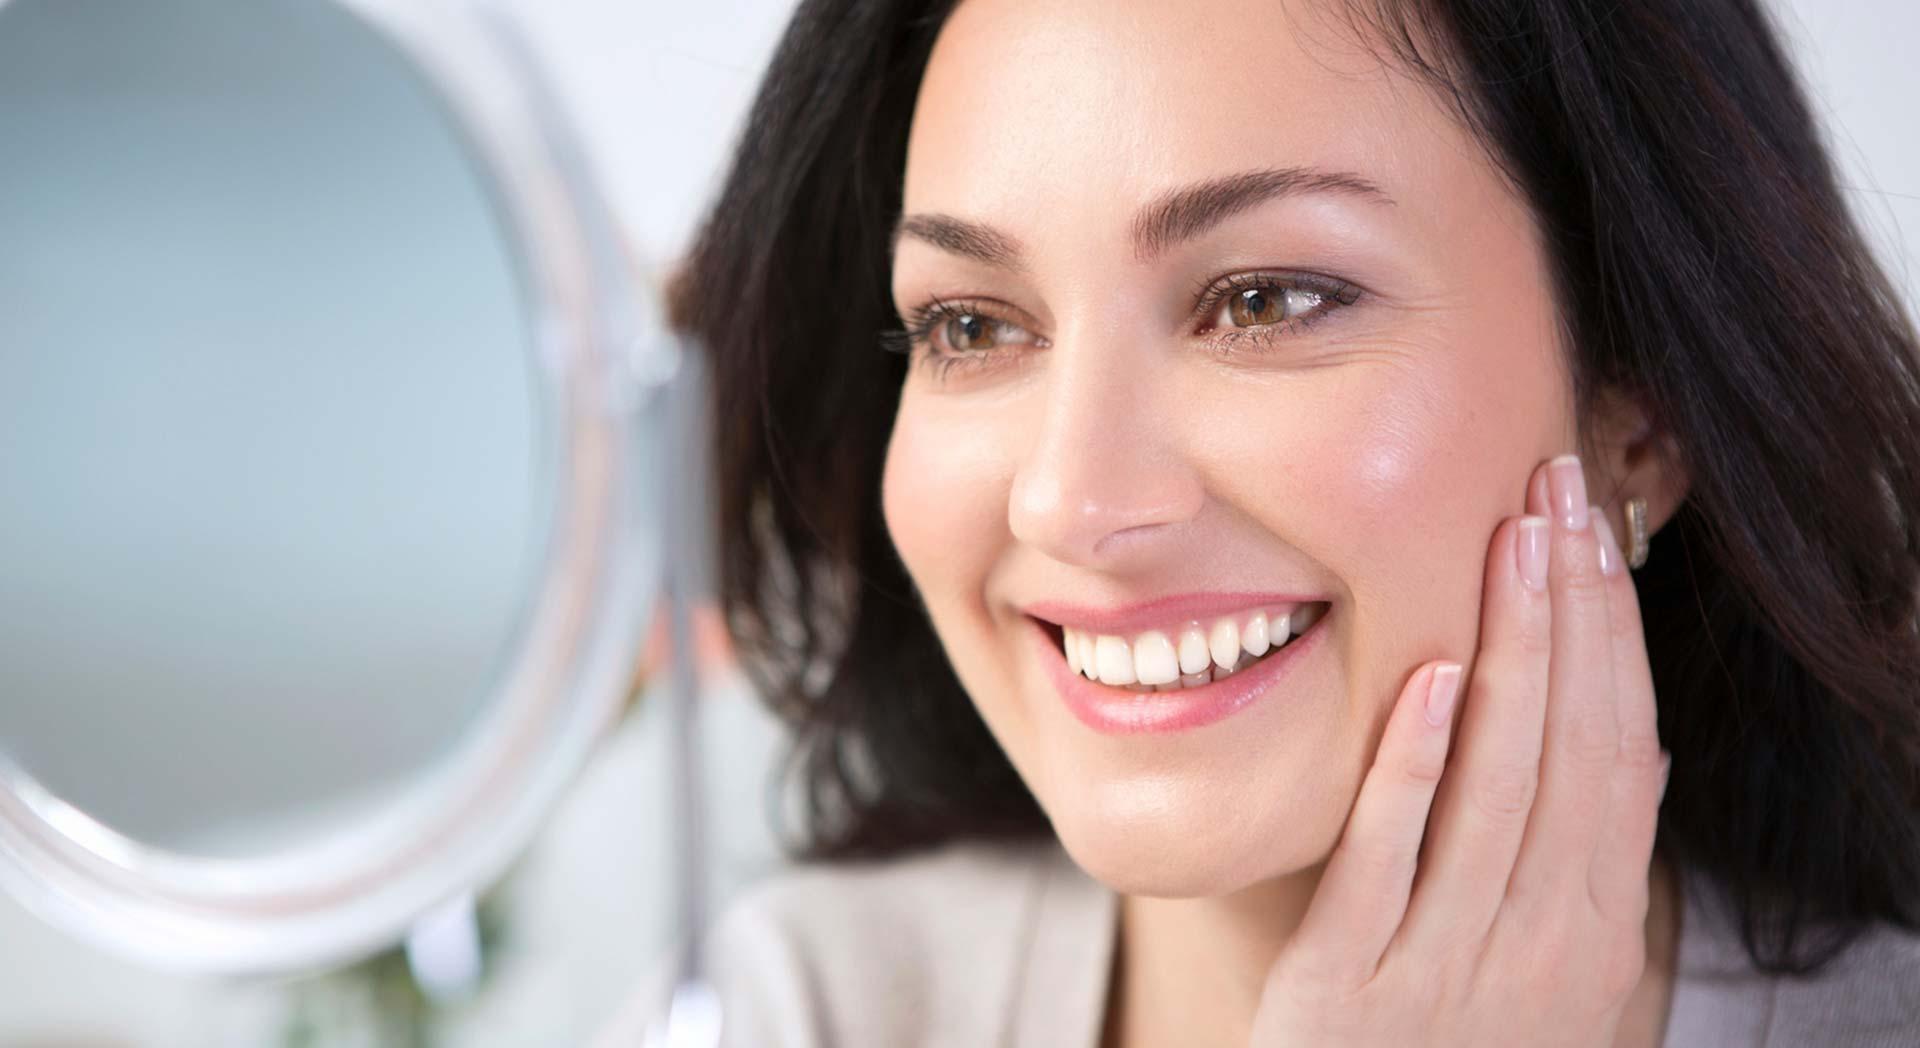 Calgary Laser Peels | Facial Esthetics One